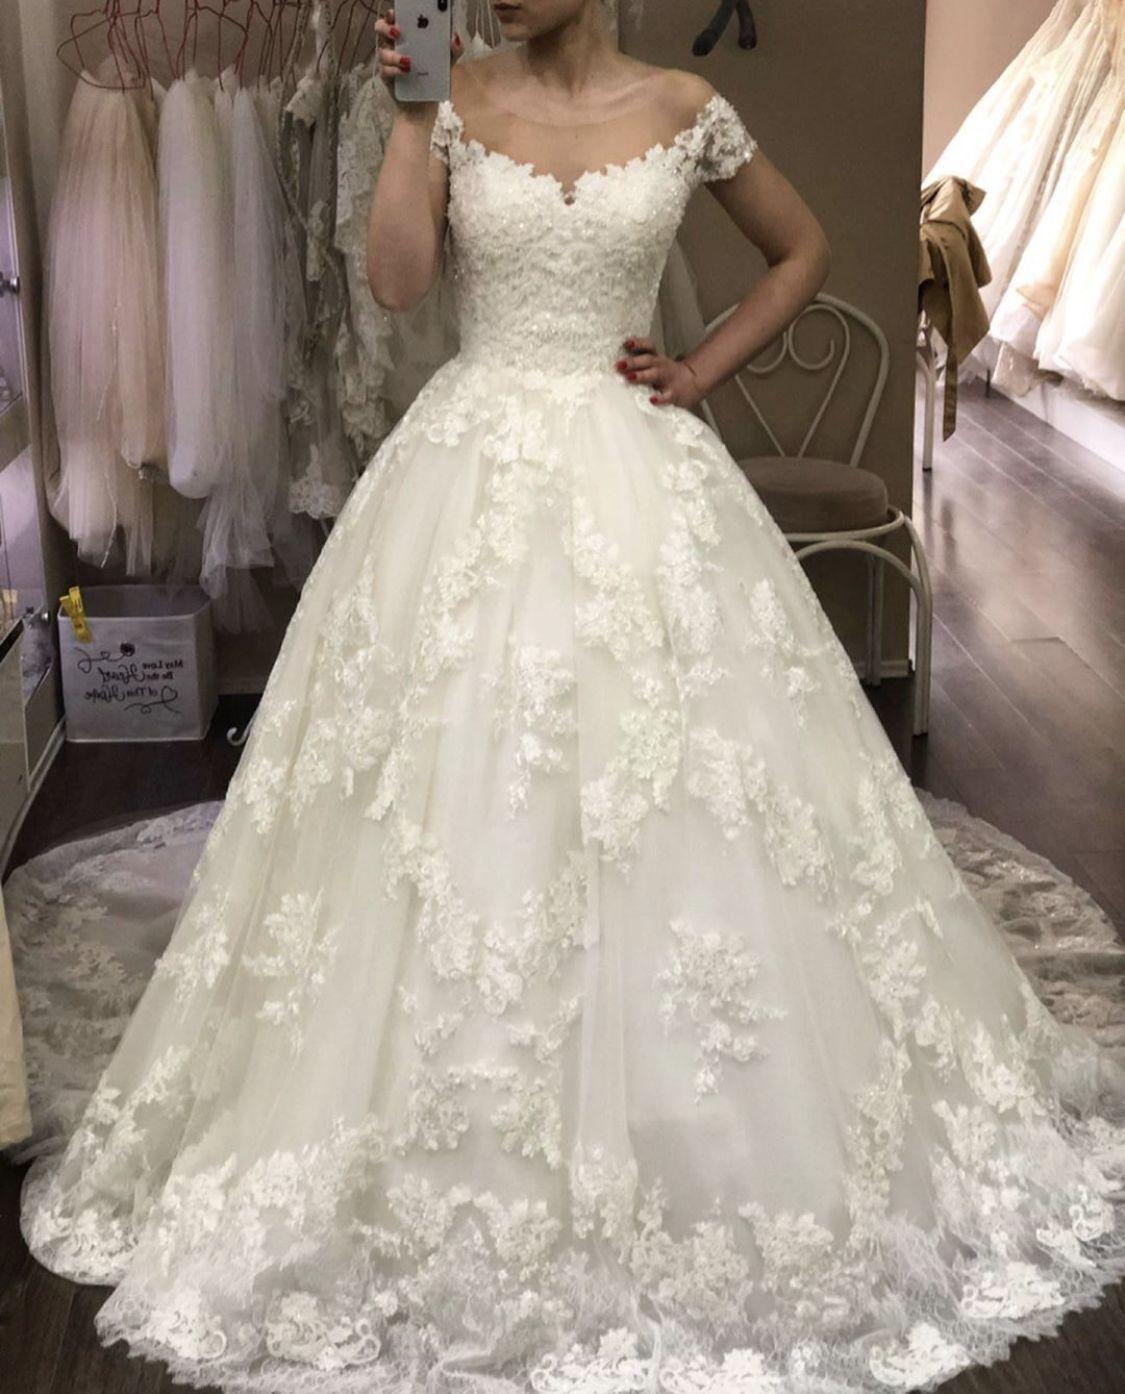 Wedding Dress Princess Style Diana Princess Style Wedding Dresses Princess Wedding Dresses Wedding Dresses